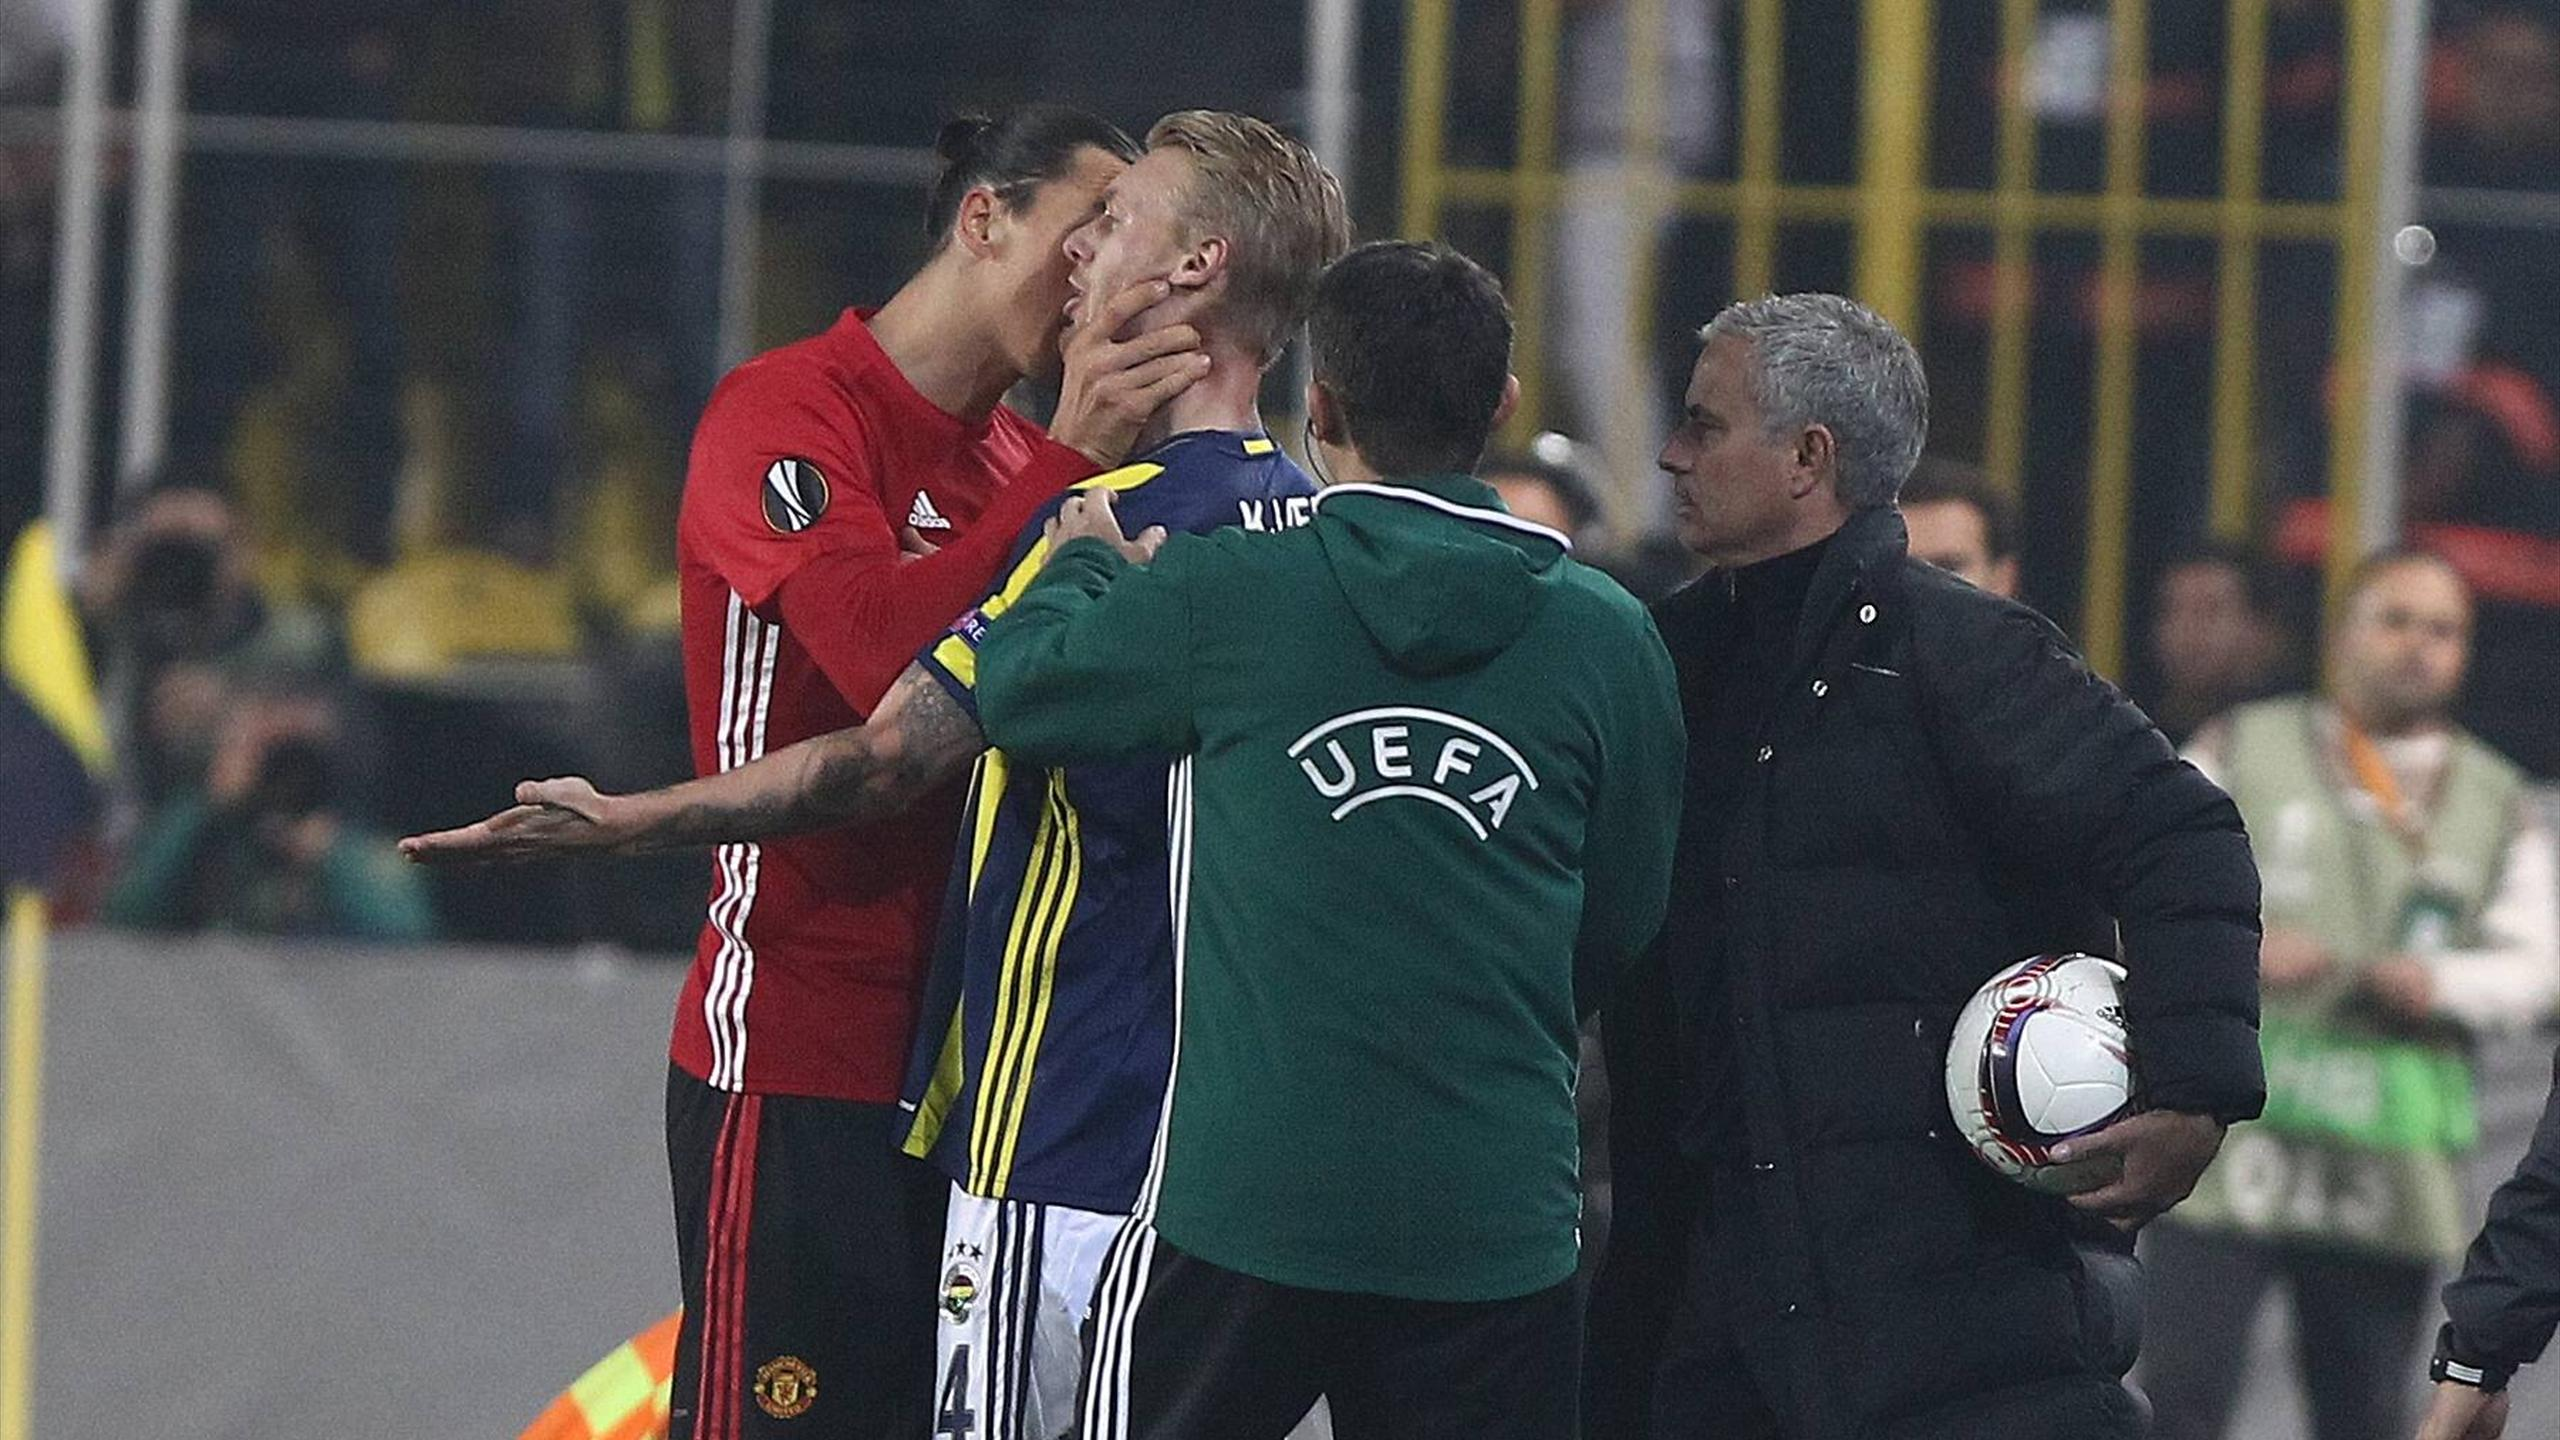 Zlatan Ibrahimovic (Manchester United) vs. Simon Kjaer (Fenerbahce)